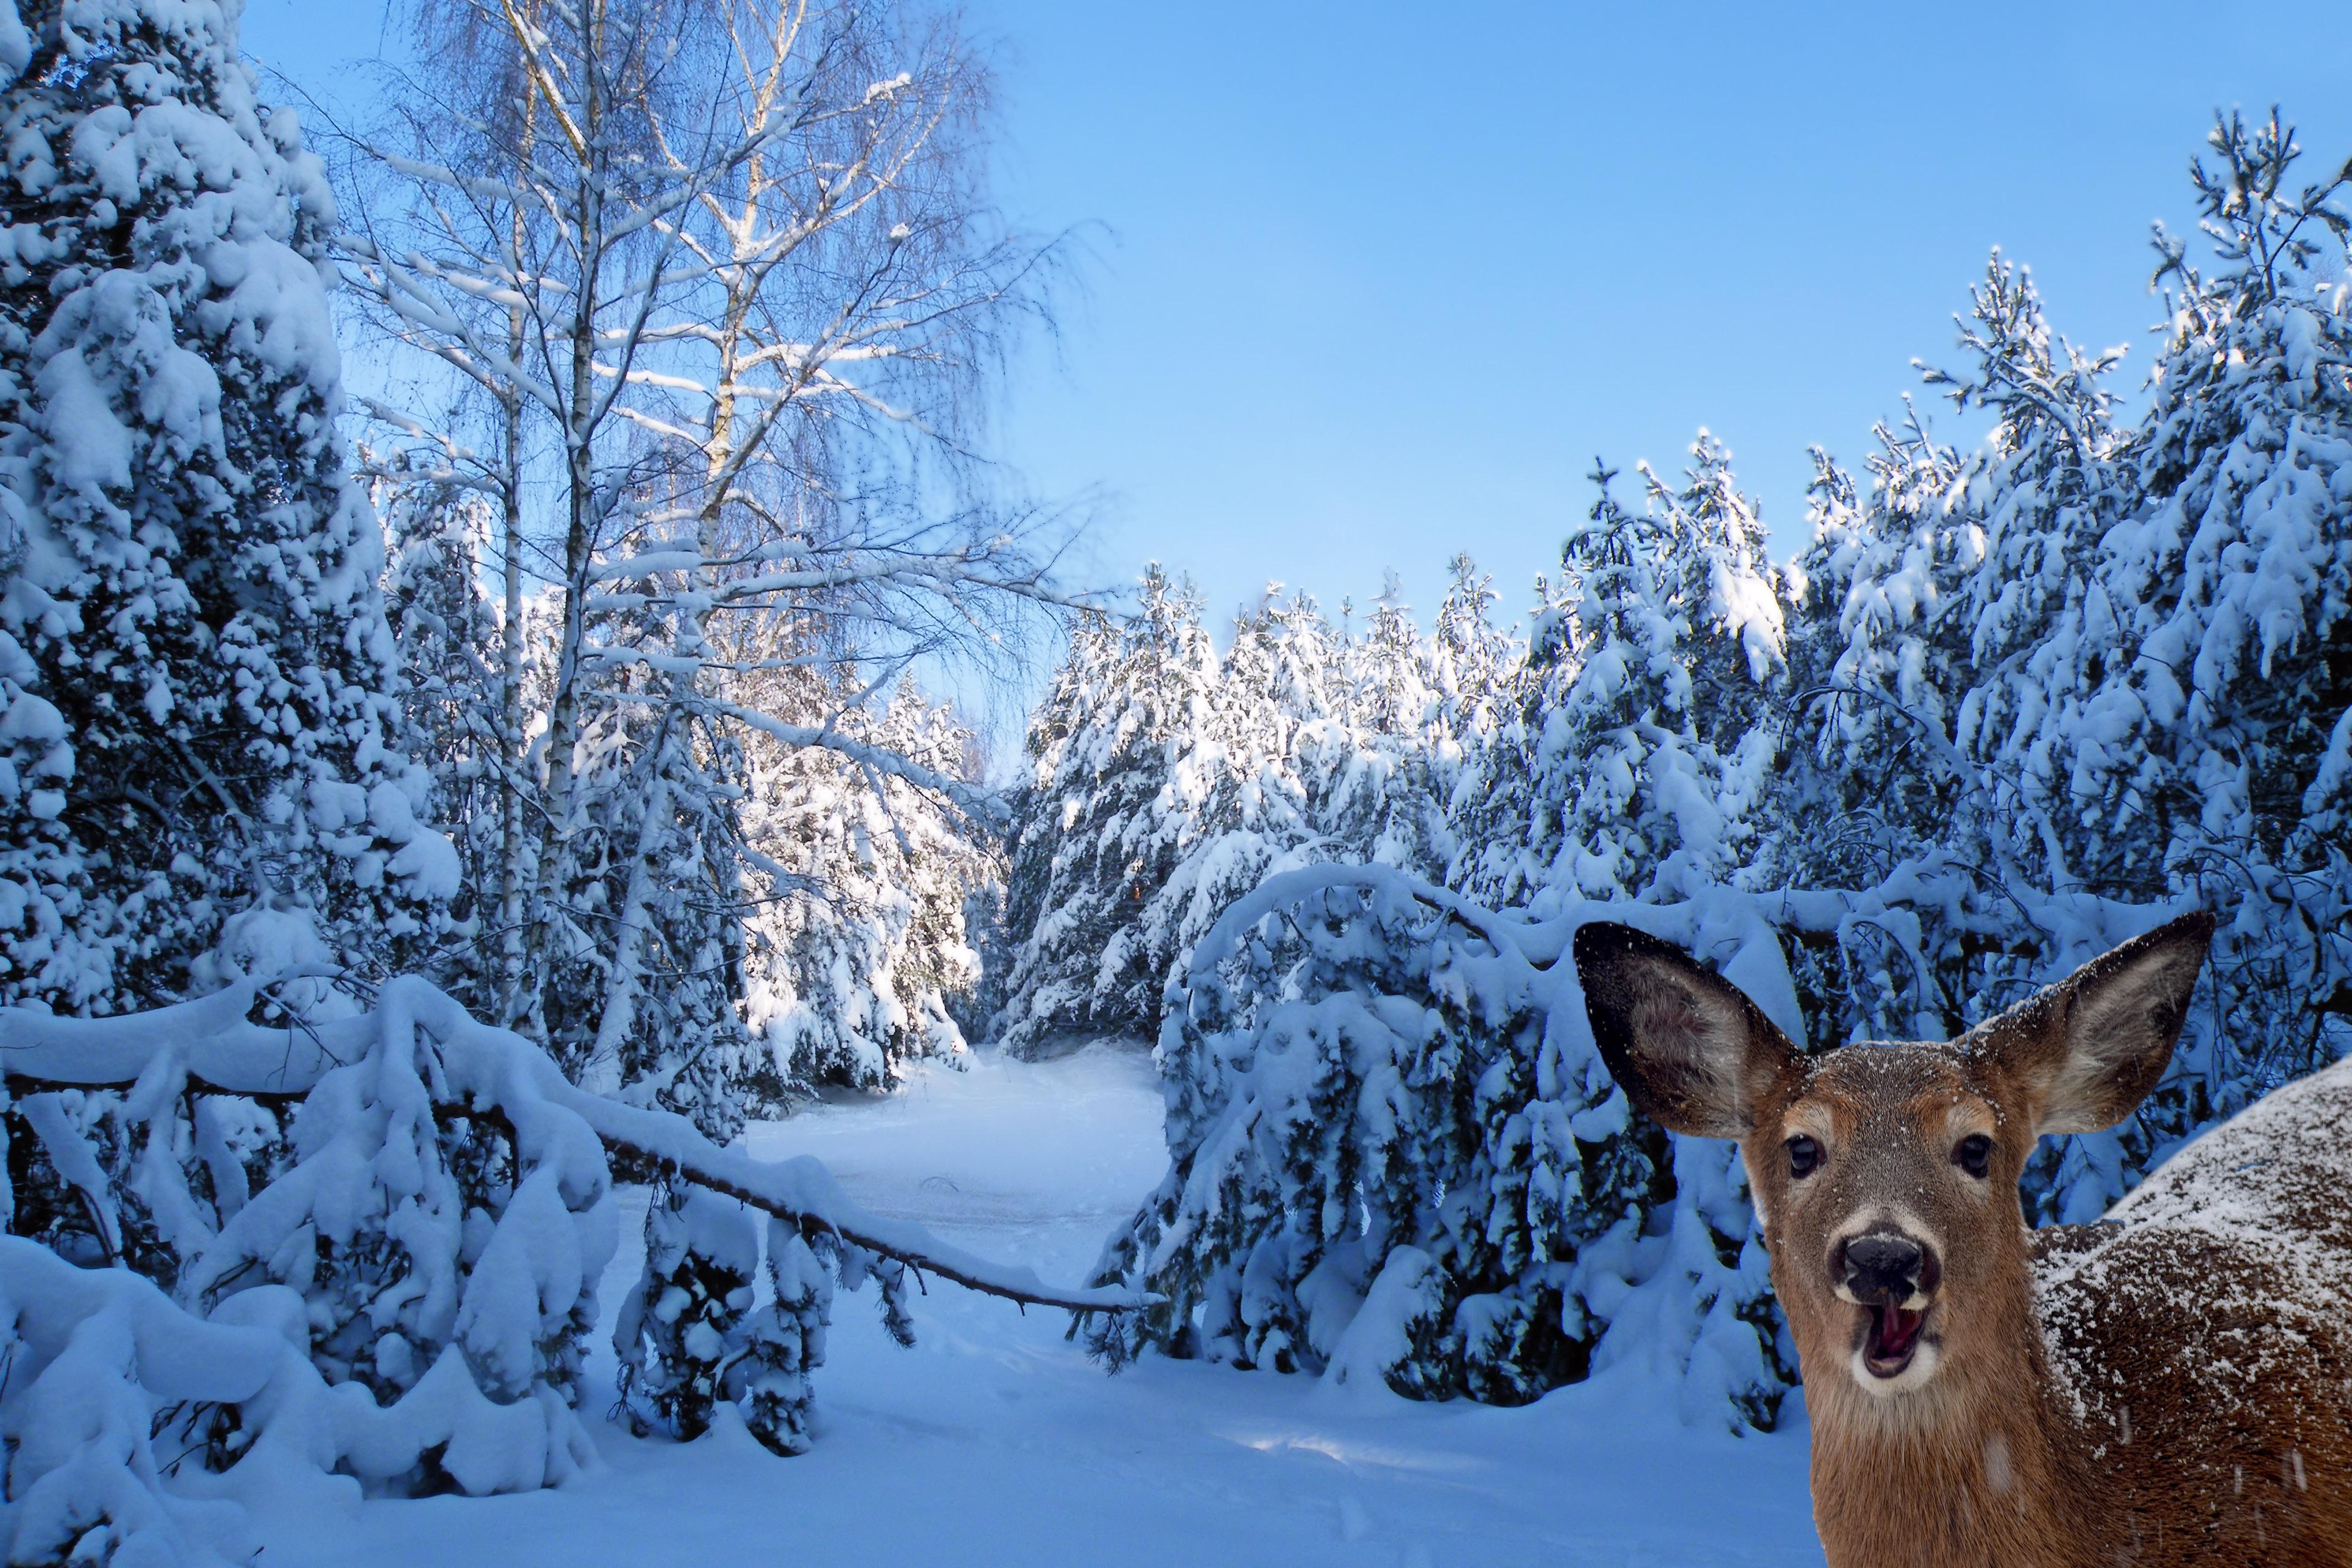 The Christmas Tree Deer Park